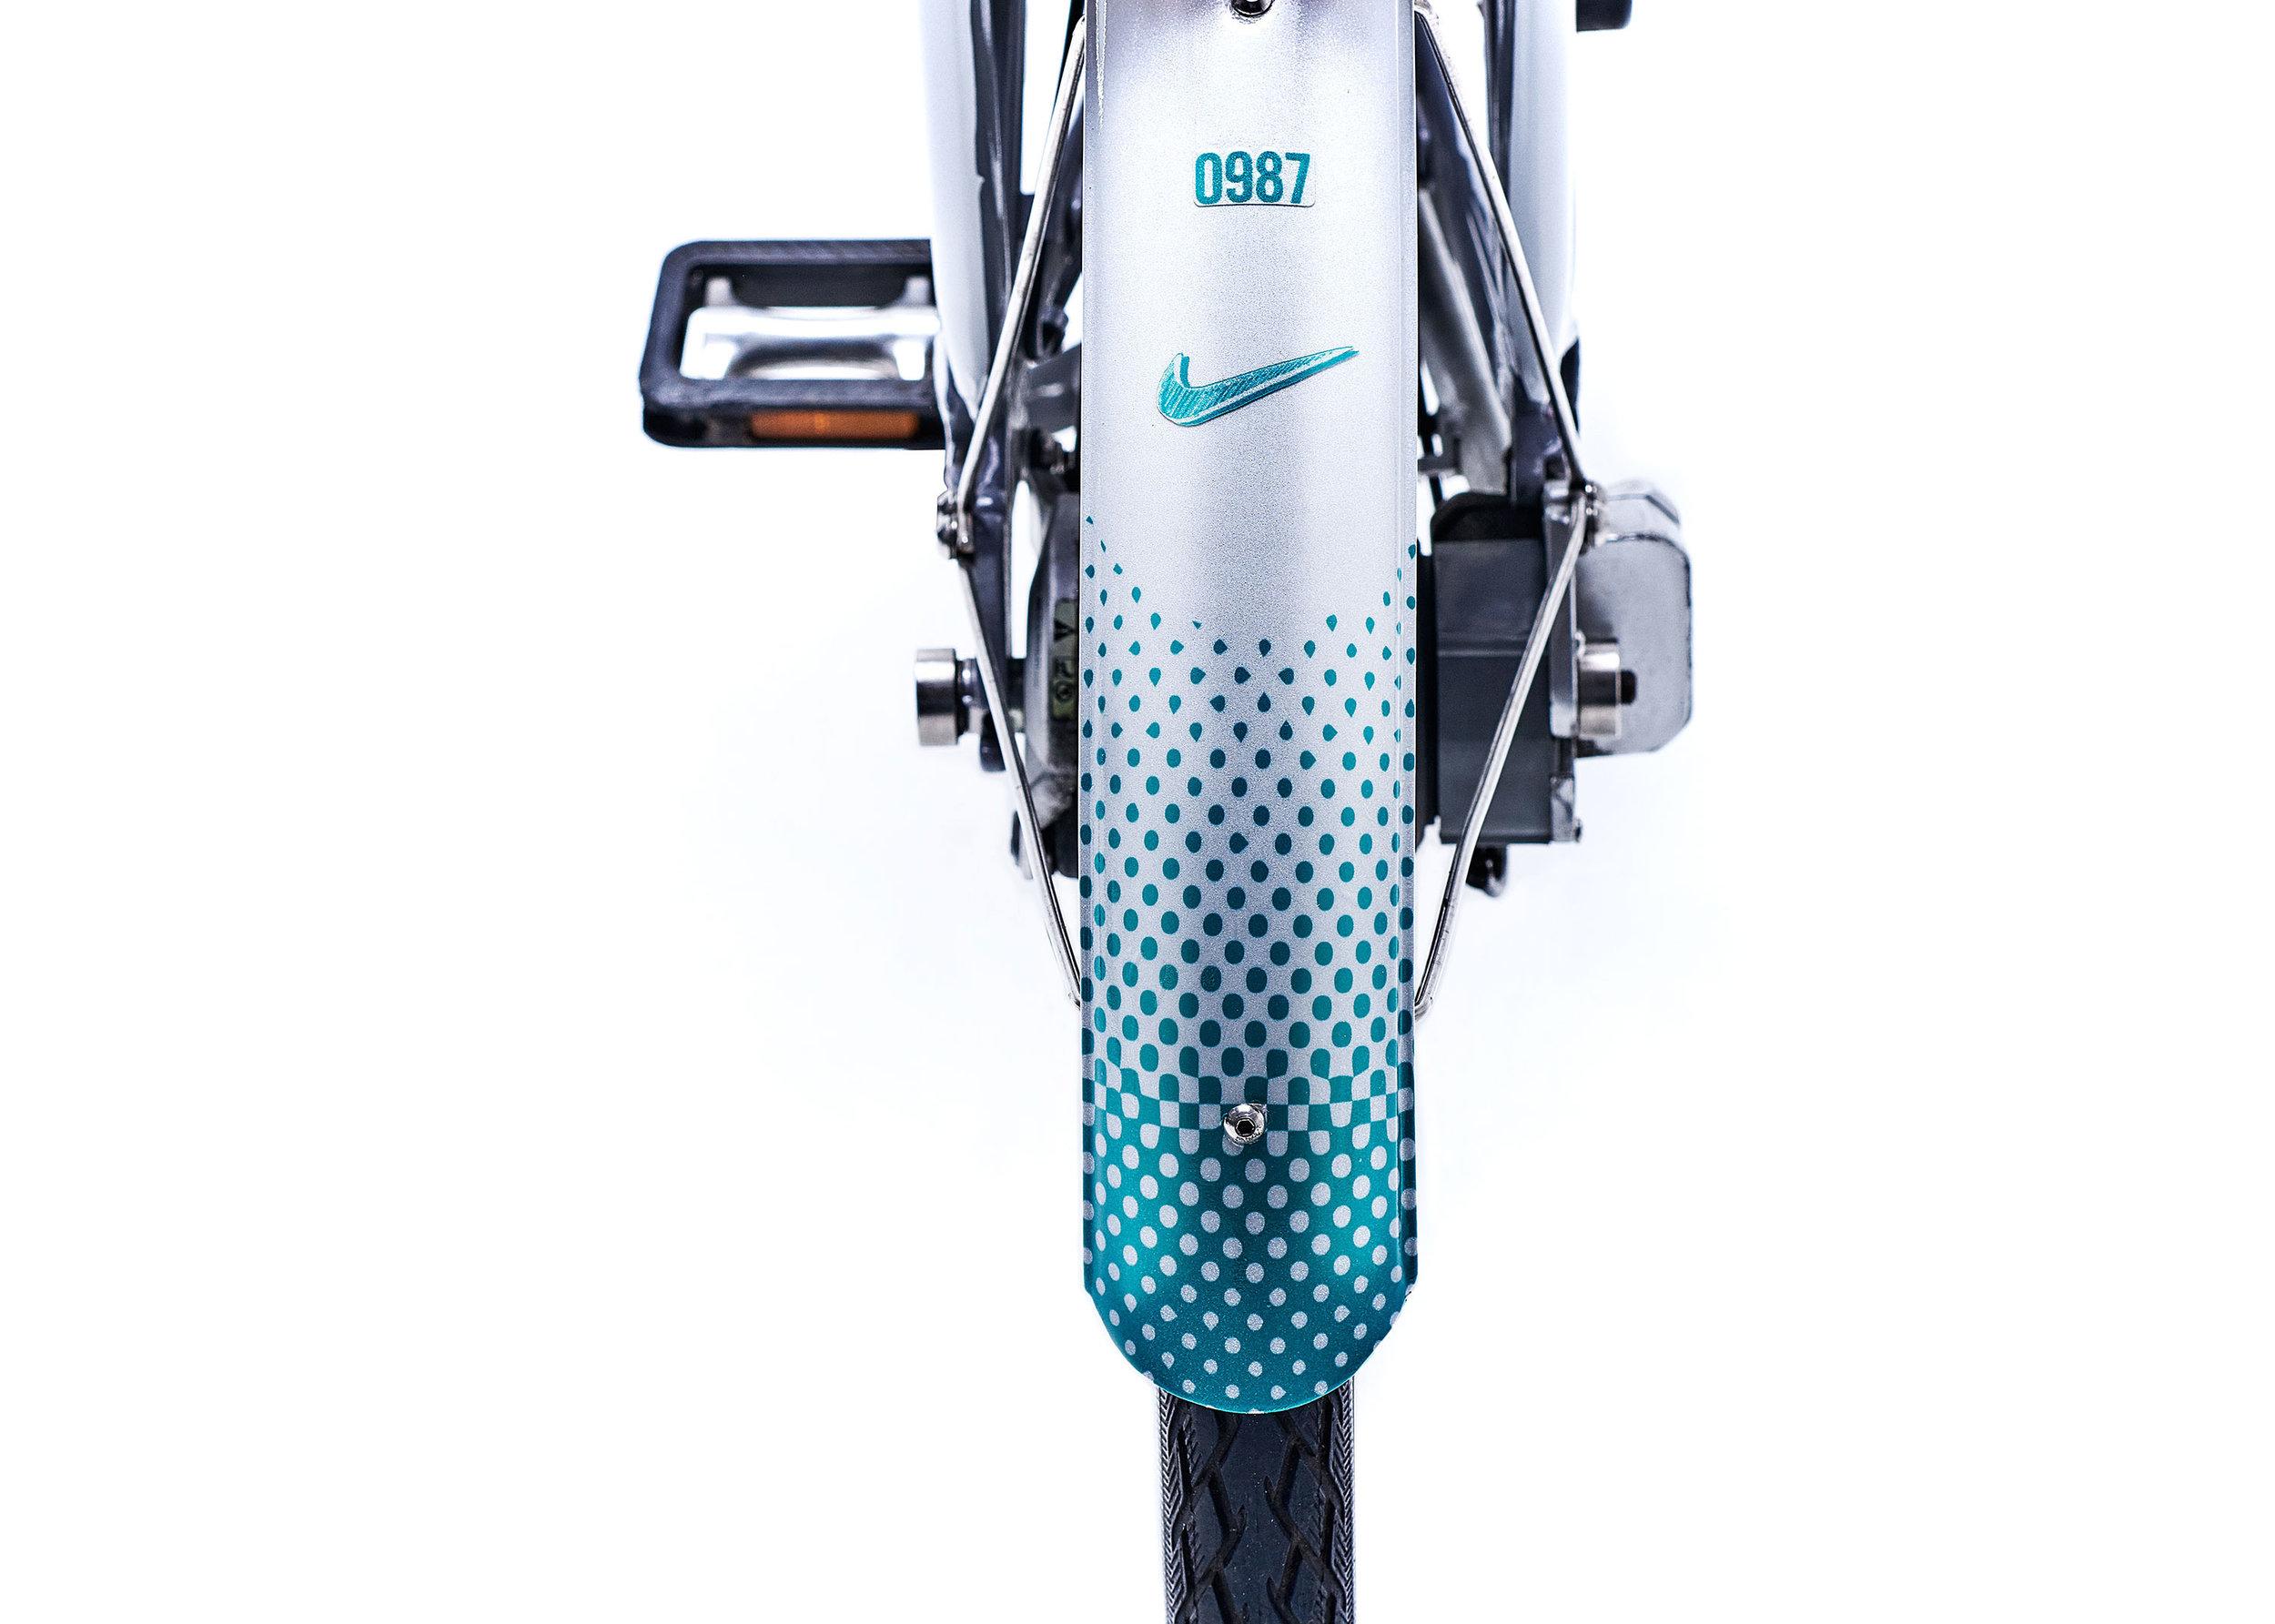 Nike_BIKETOWN_Wraps_BHM_2019_fender04_original.jpg